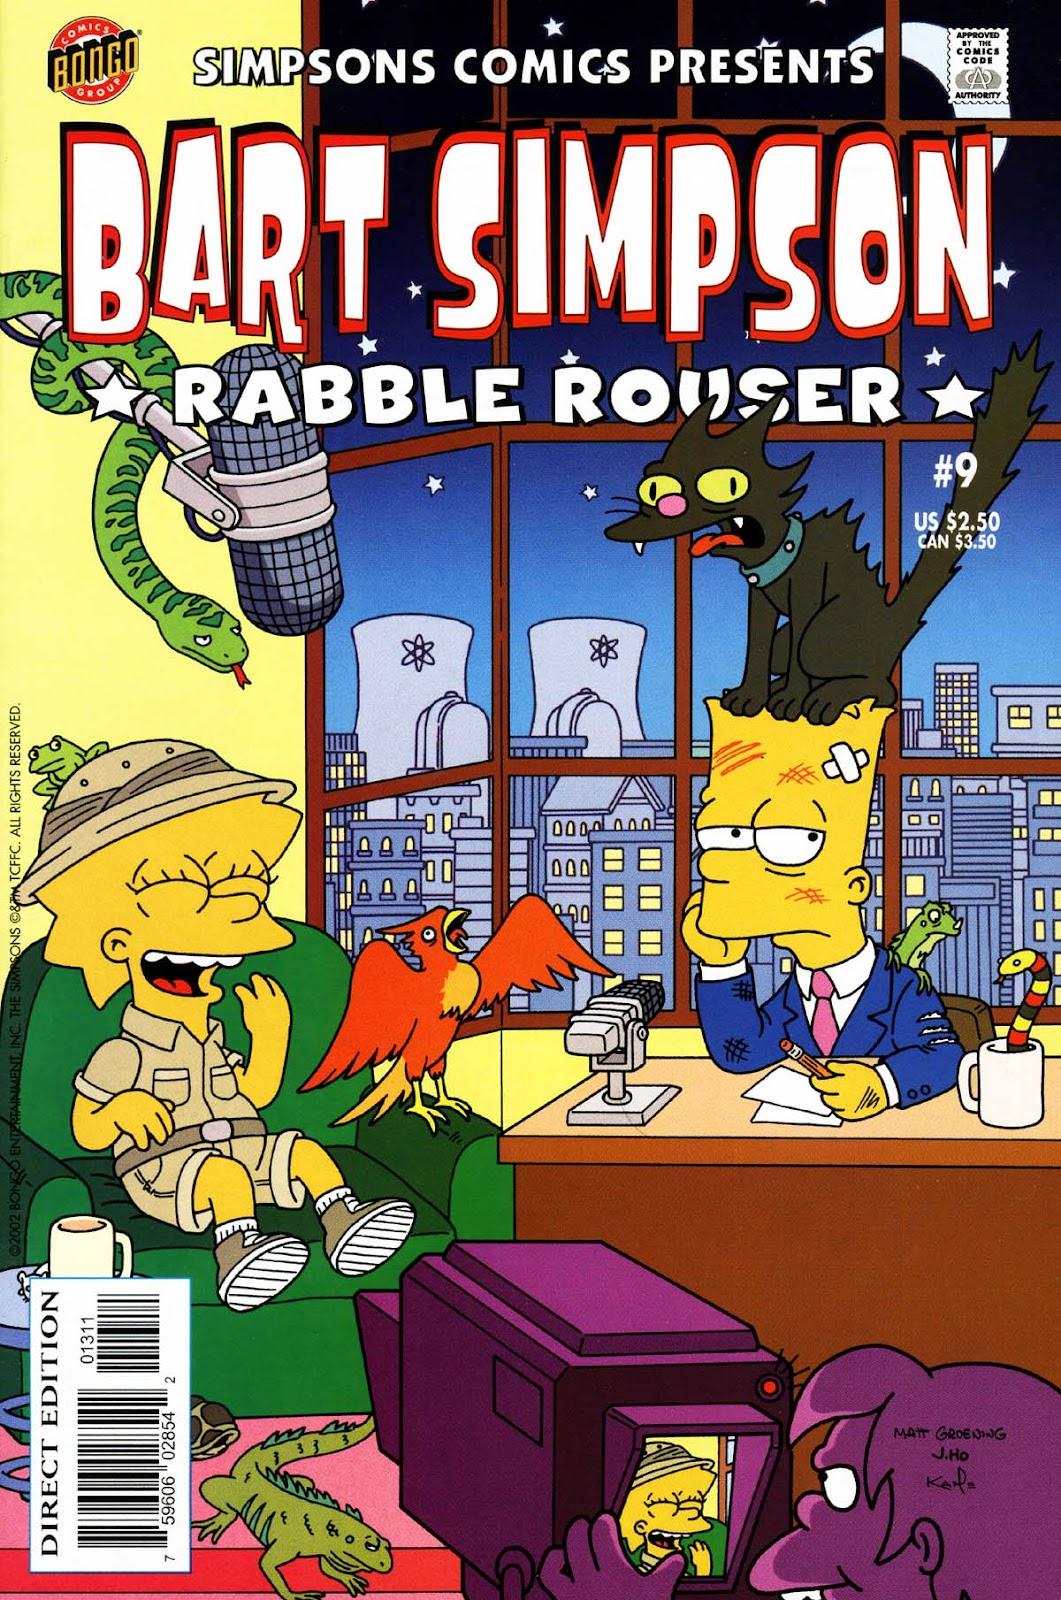 Simpsons Comics Presents Bart Simpson 9 Page 1